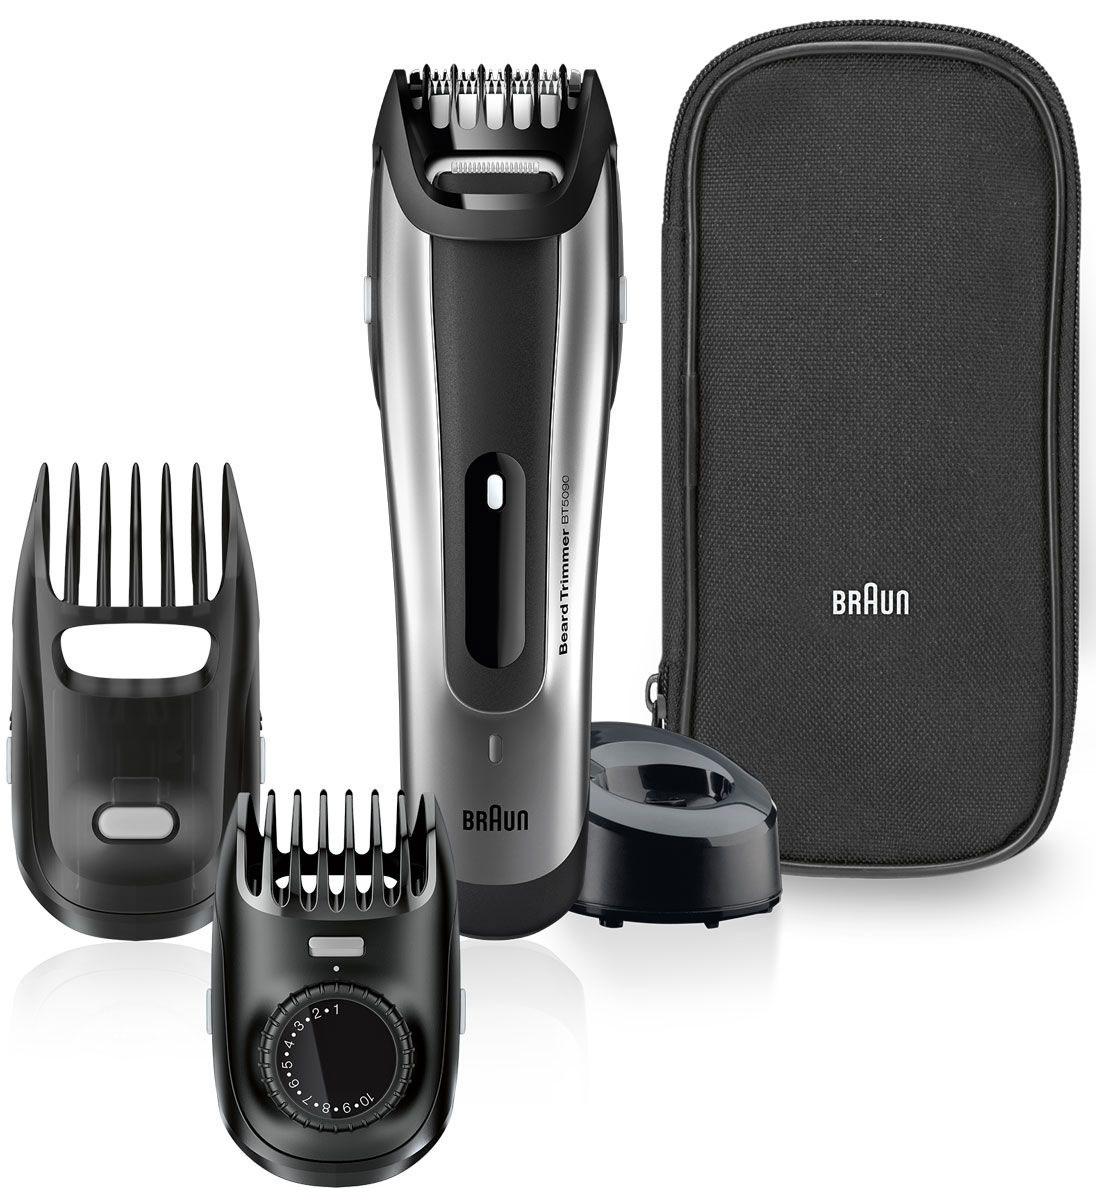 все цены на Триммер для бороды и усов Braun BT 5090 онлайн